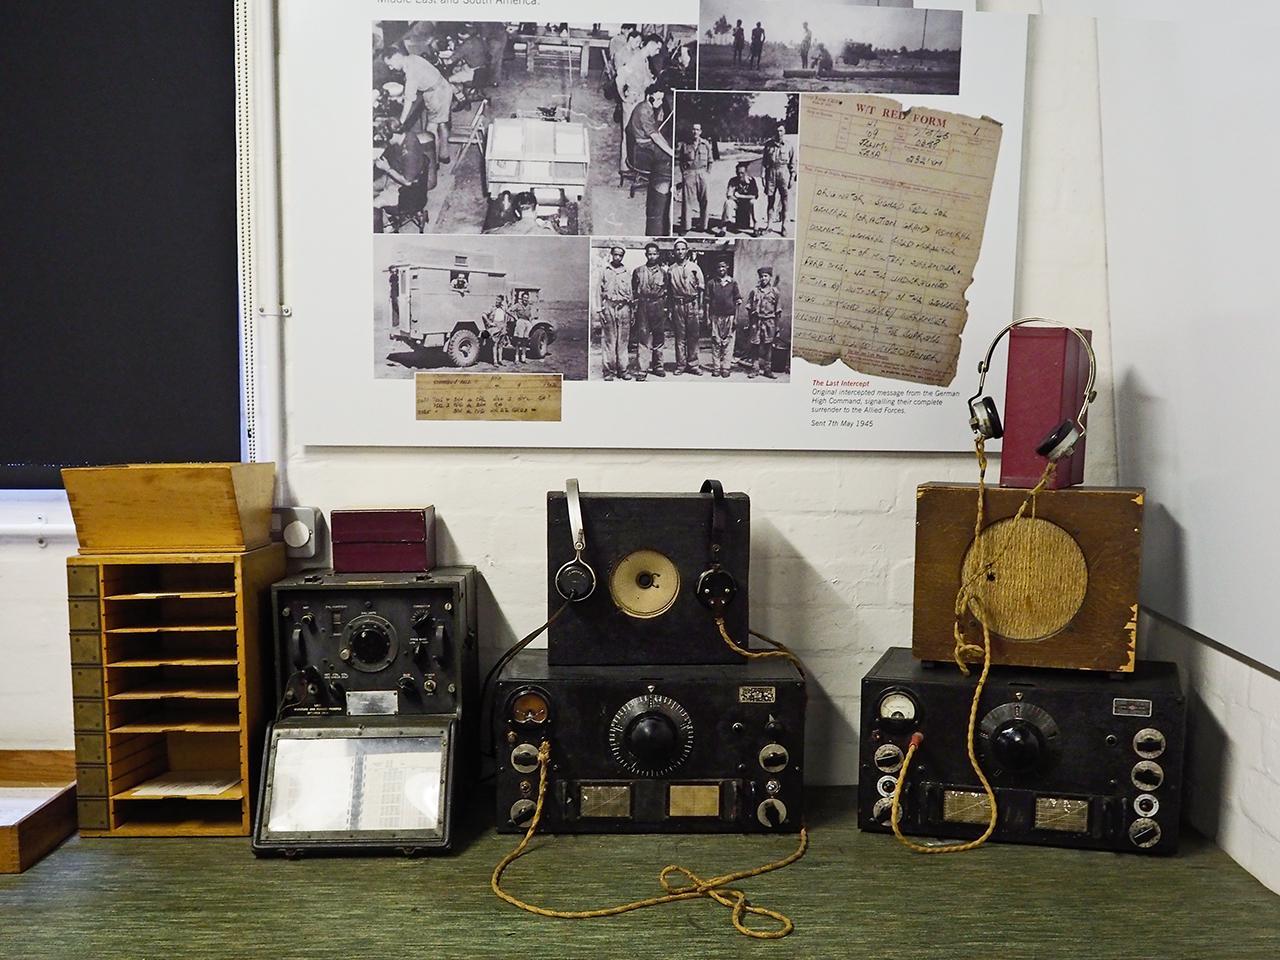 vieux postes de radio